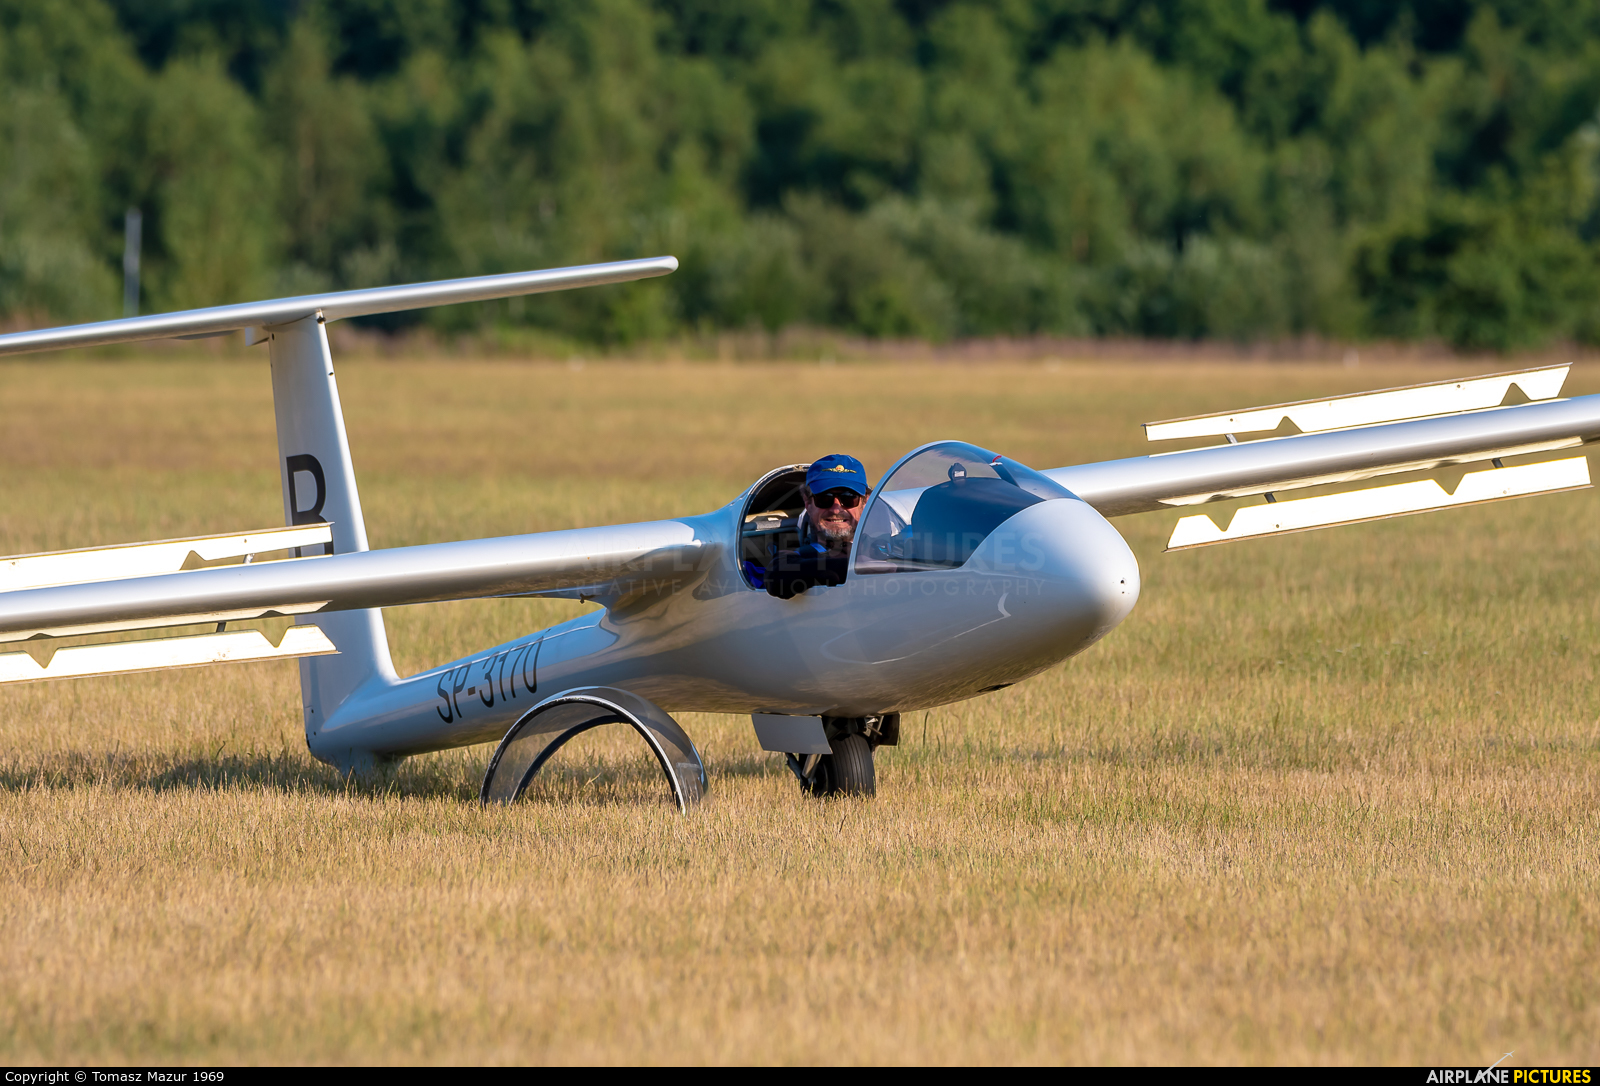 Aeroclub ROW SP-3170 aircraft at Rybnik - Gotartowice